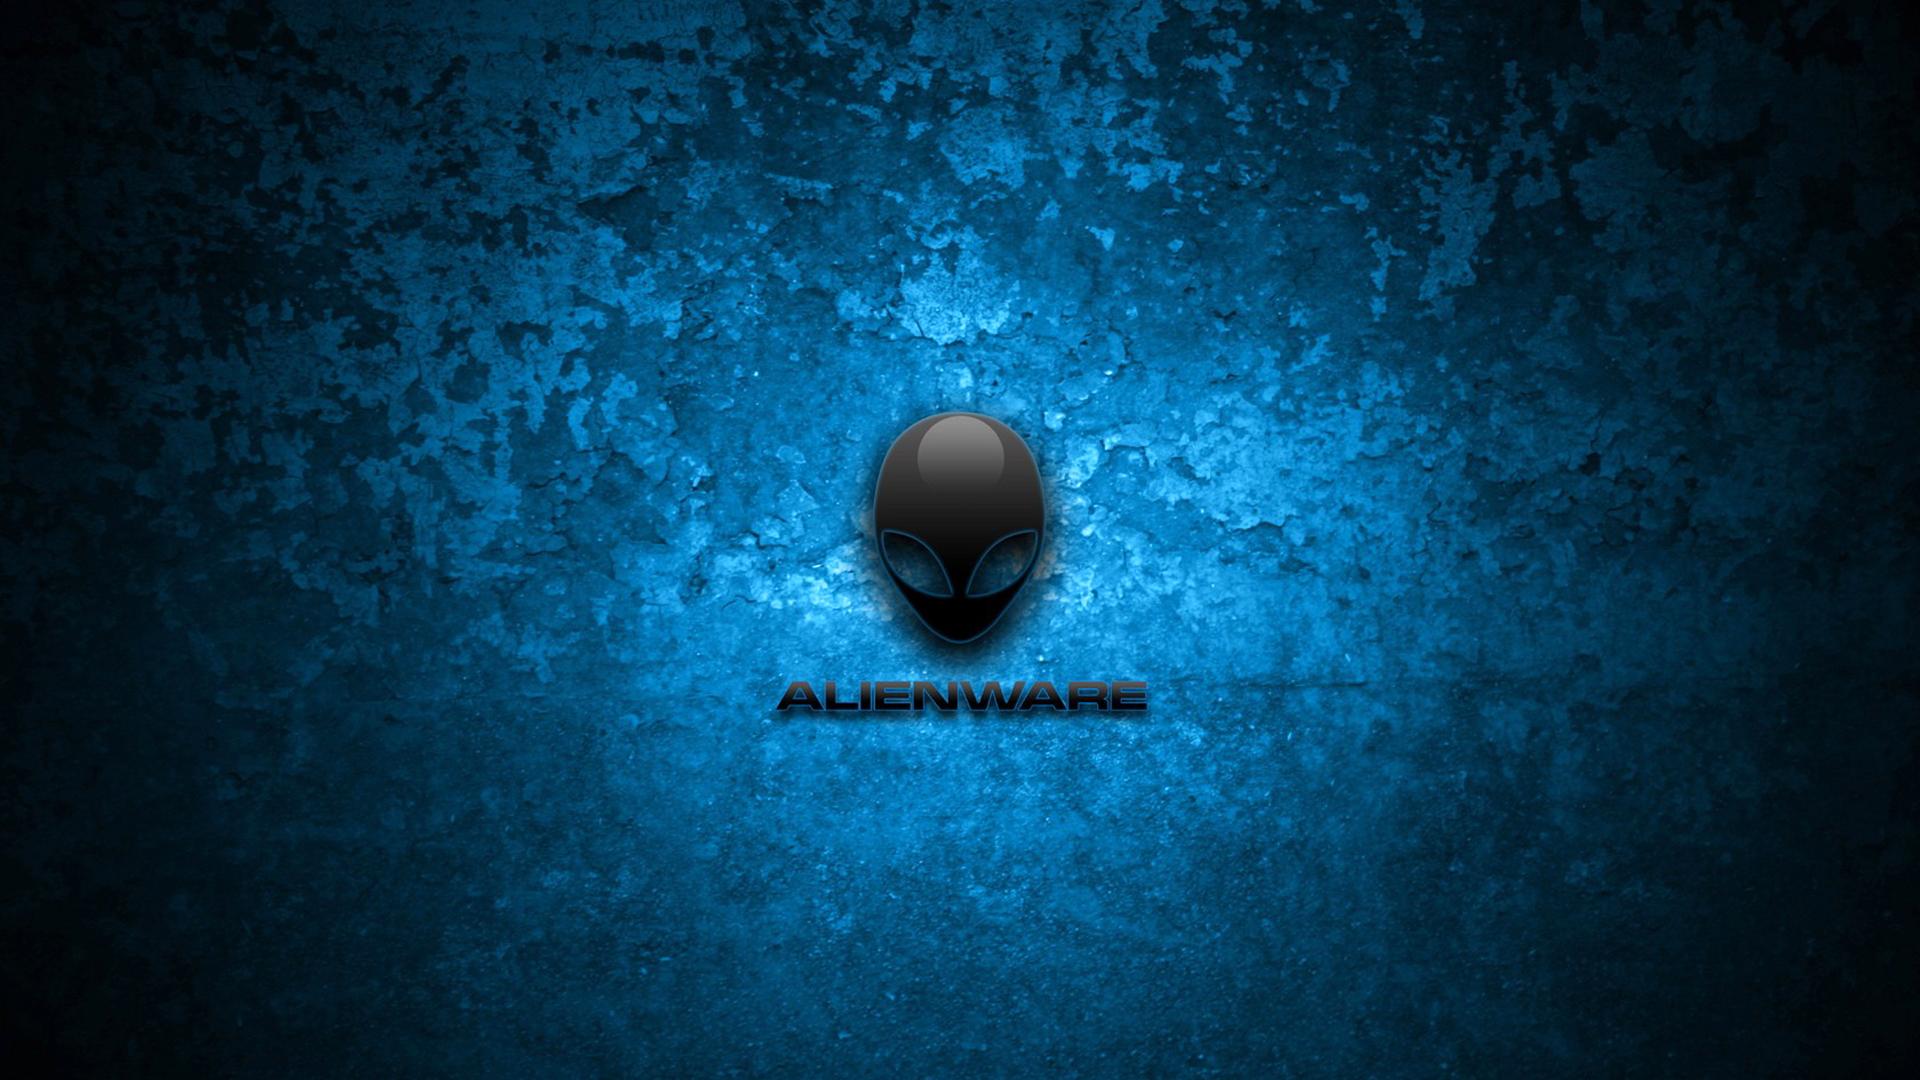 Alienware logo dark blue 42 wallpaper hd alienware simple logo dark blue voltagebd Gallery